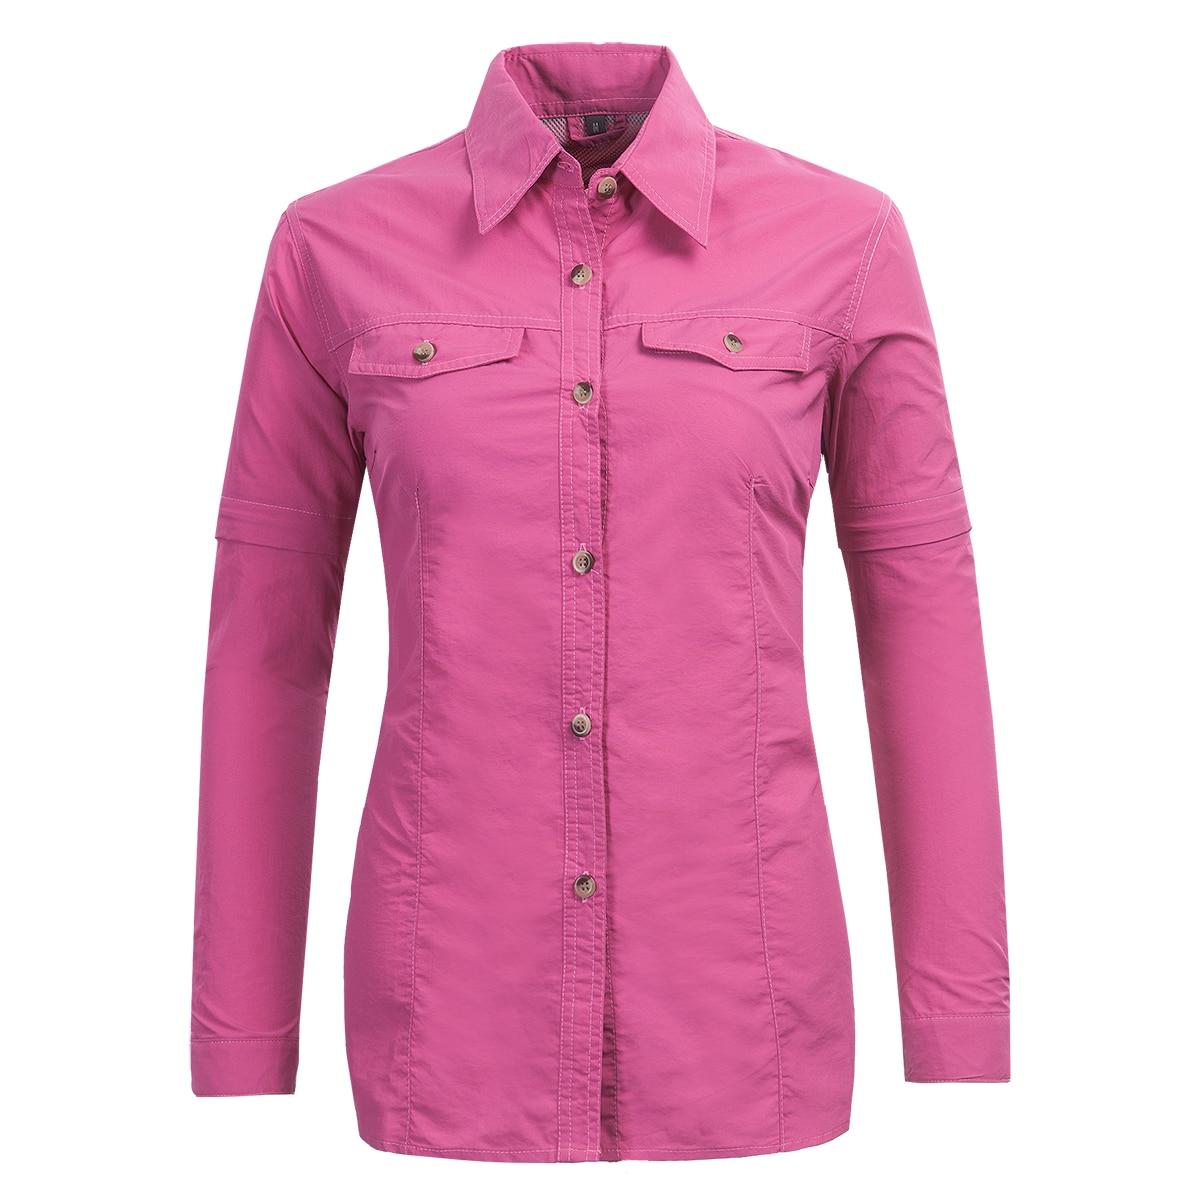 New Suncreen Detachable Sleeves Sport Fishing Clothing Camping Women Hiking Shirt Anti-uv Climbing Trekking Quick Dry Camisetas